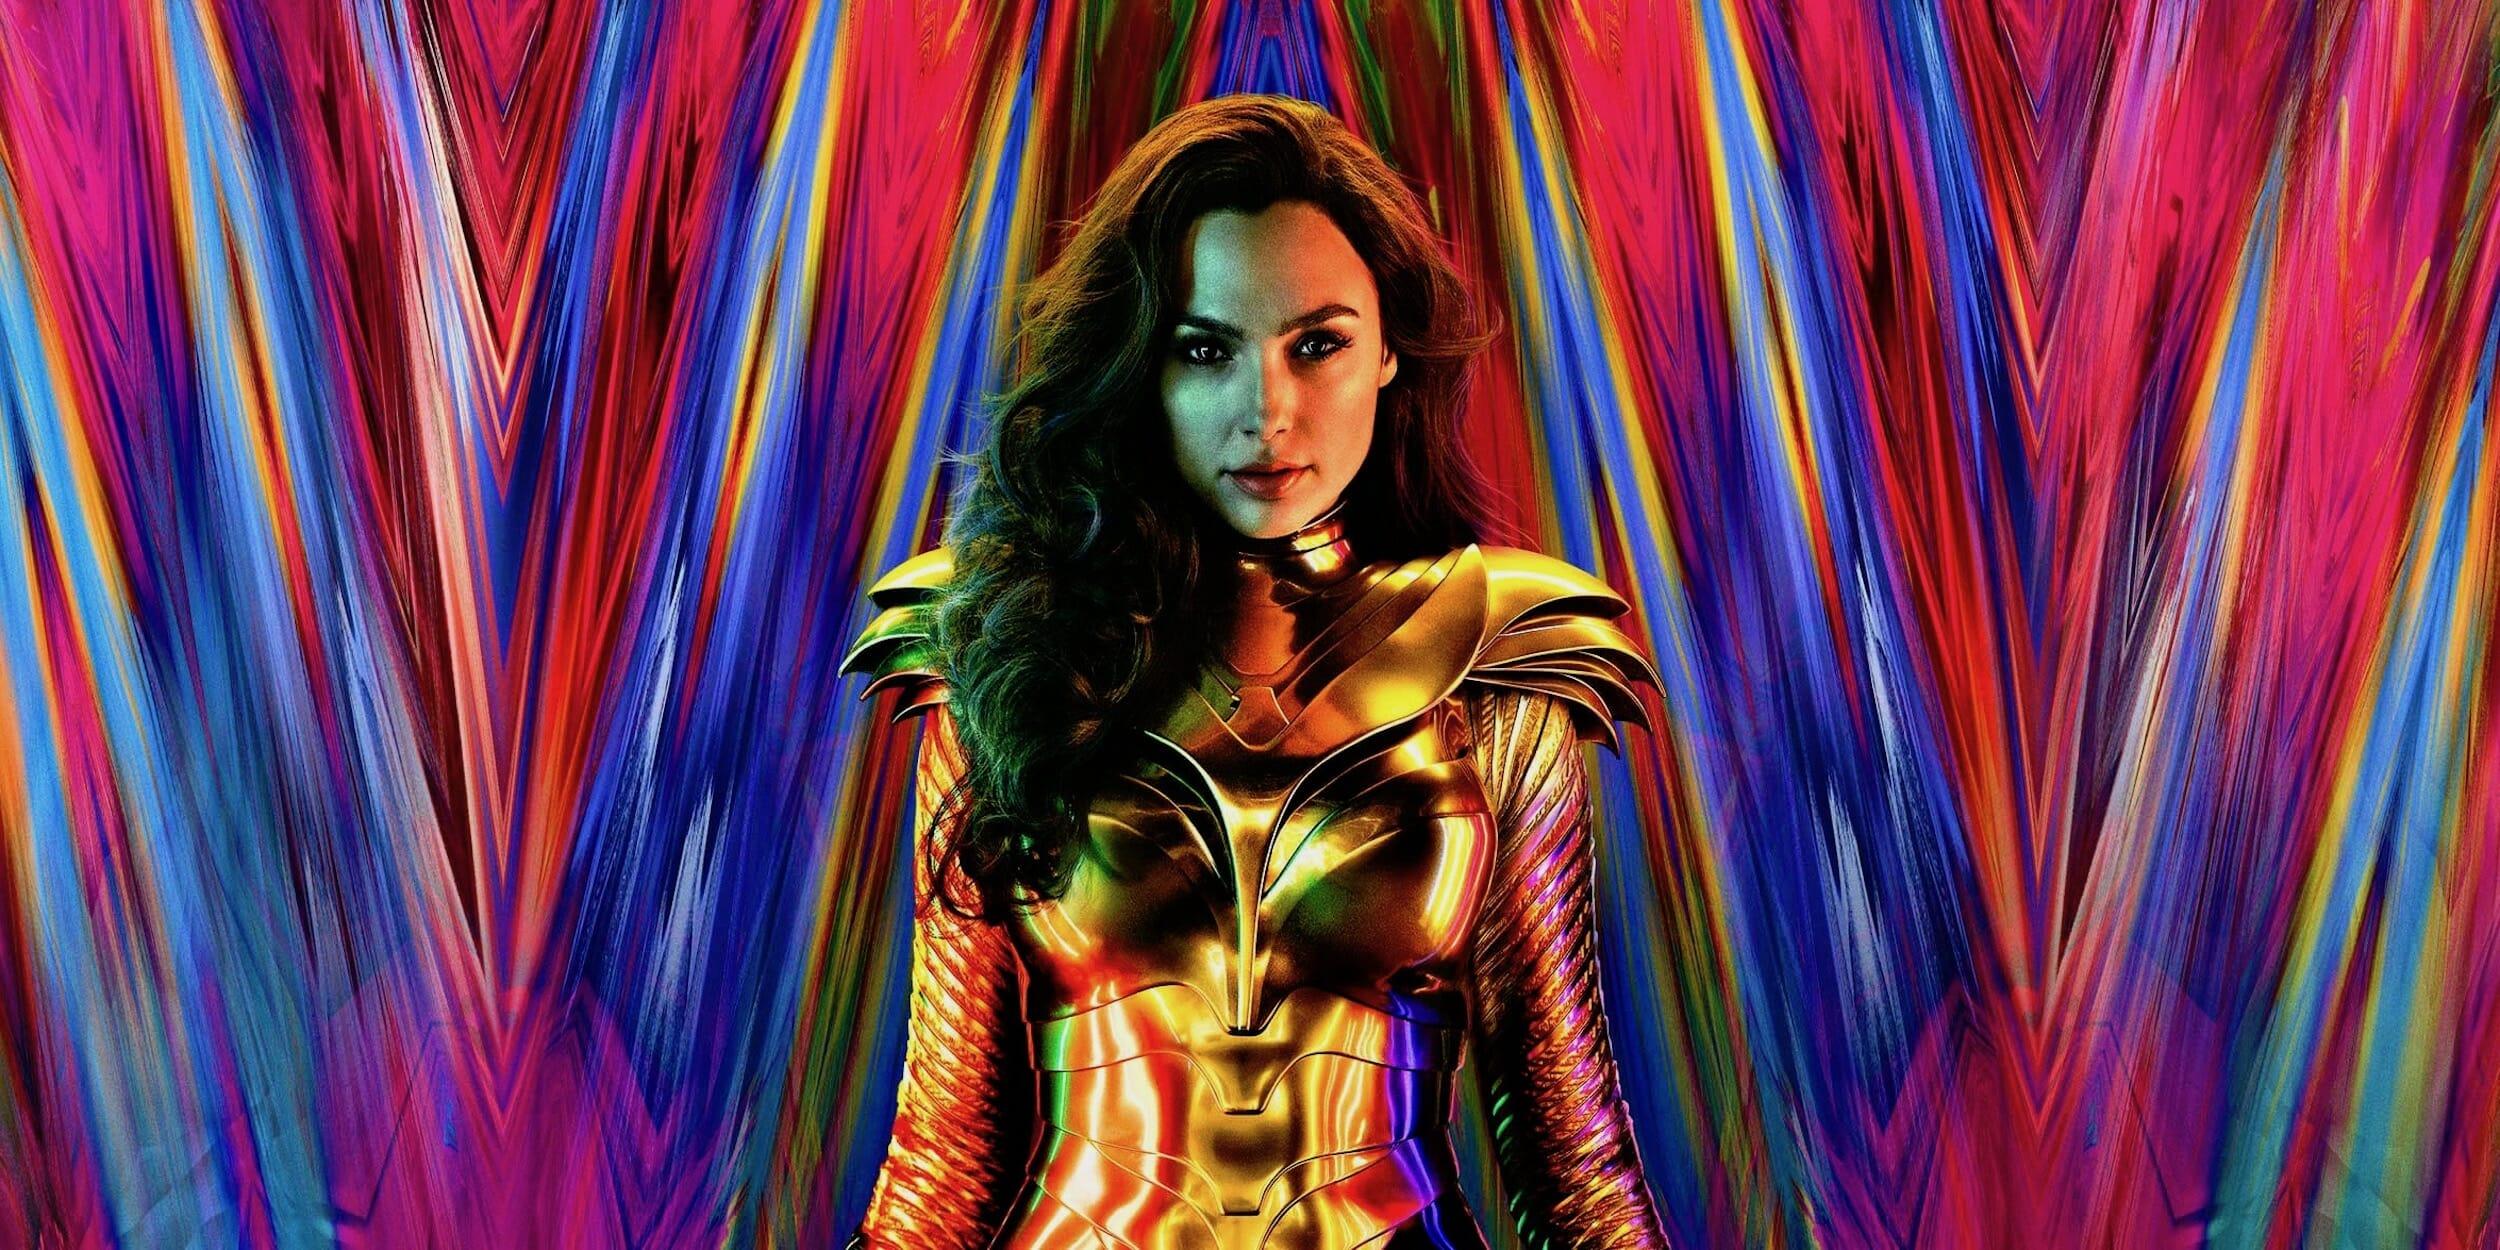 Wonder Woman, an iconic female hero of the cinematic era.